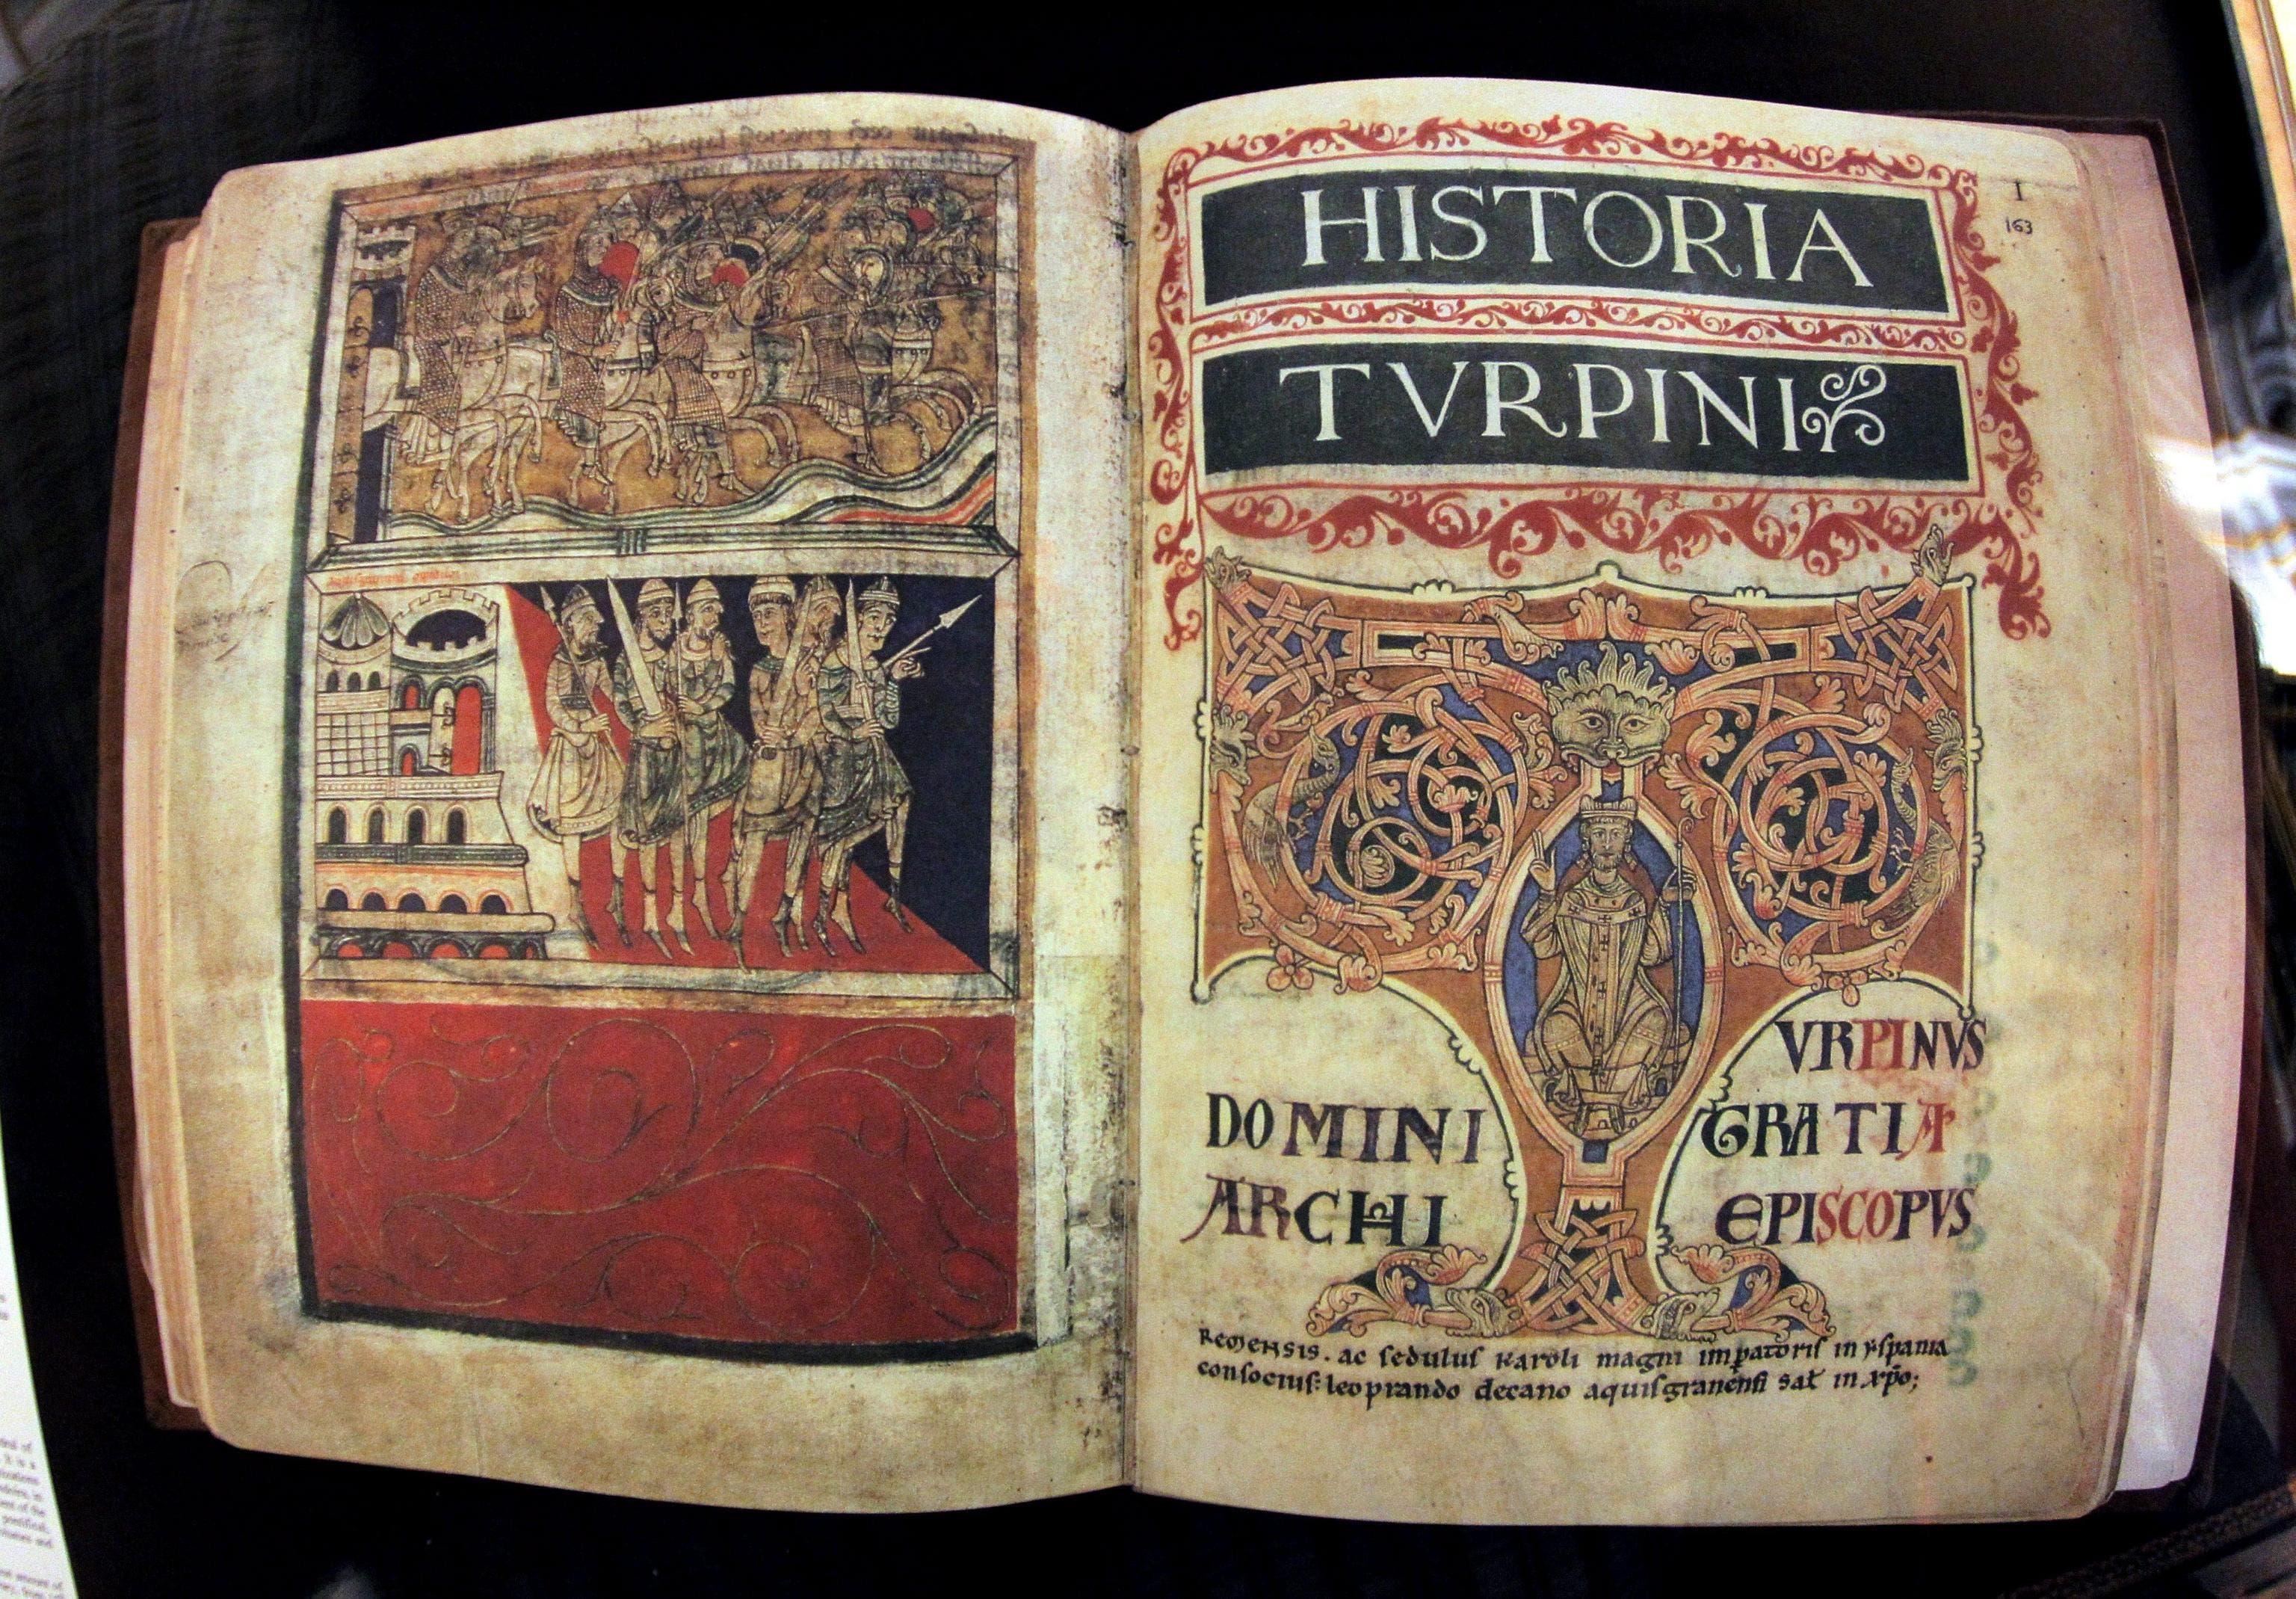 Ex-electrician stands trial for priceless Codex Calixtinus manuscript theft